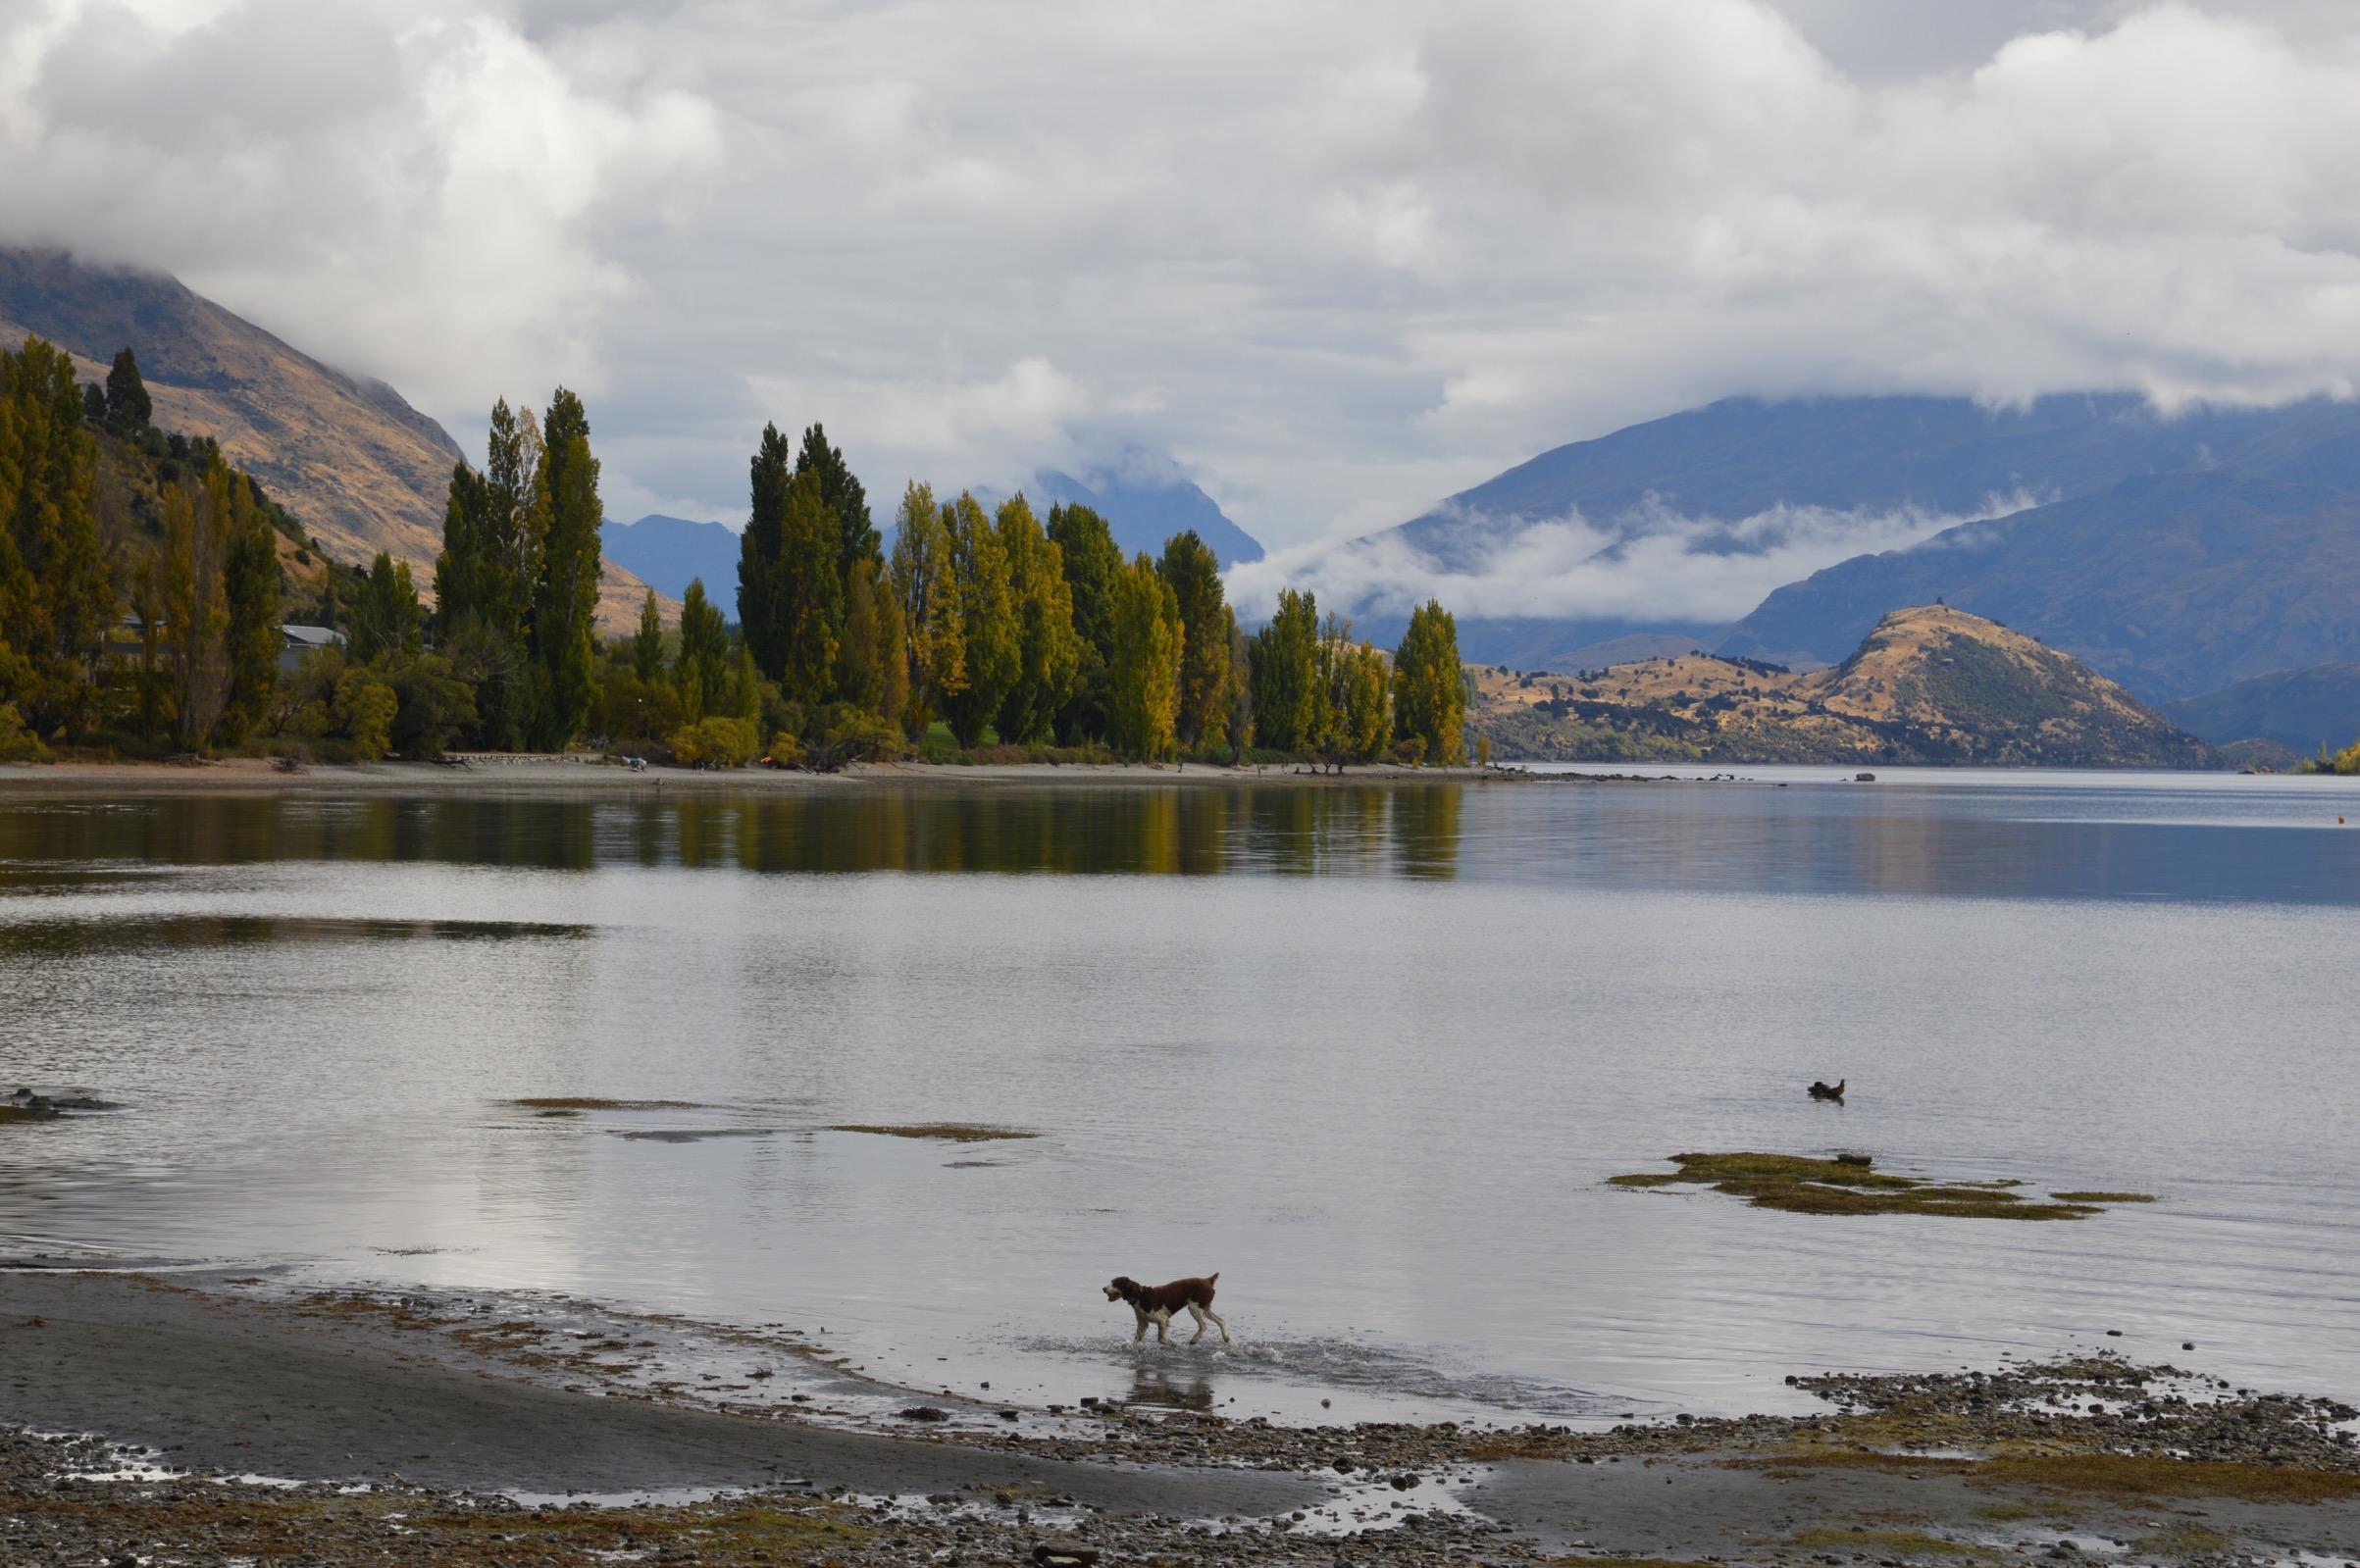 Dog playing in Lake Wanaka, New Zealand